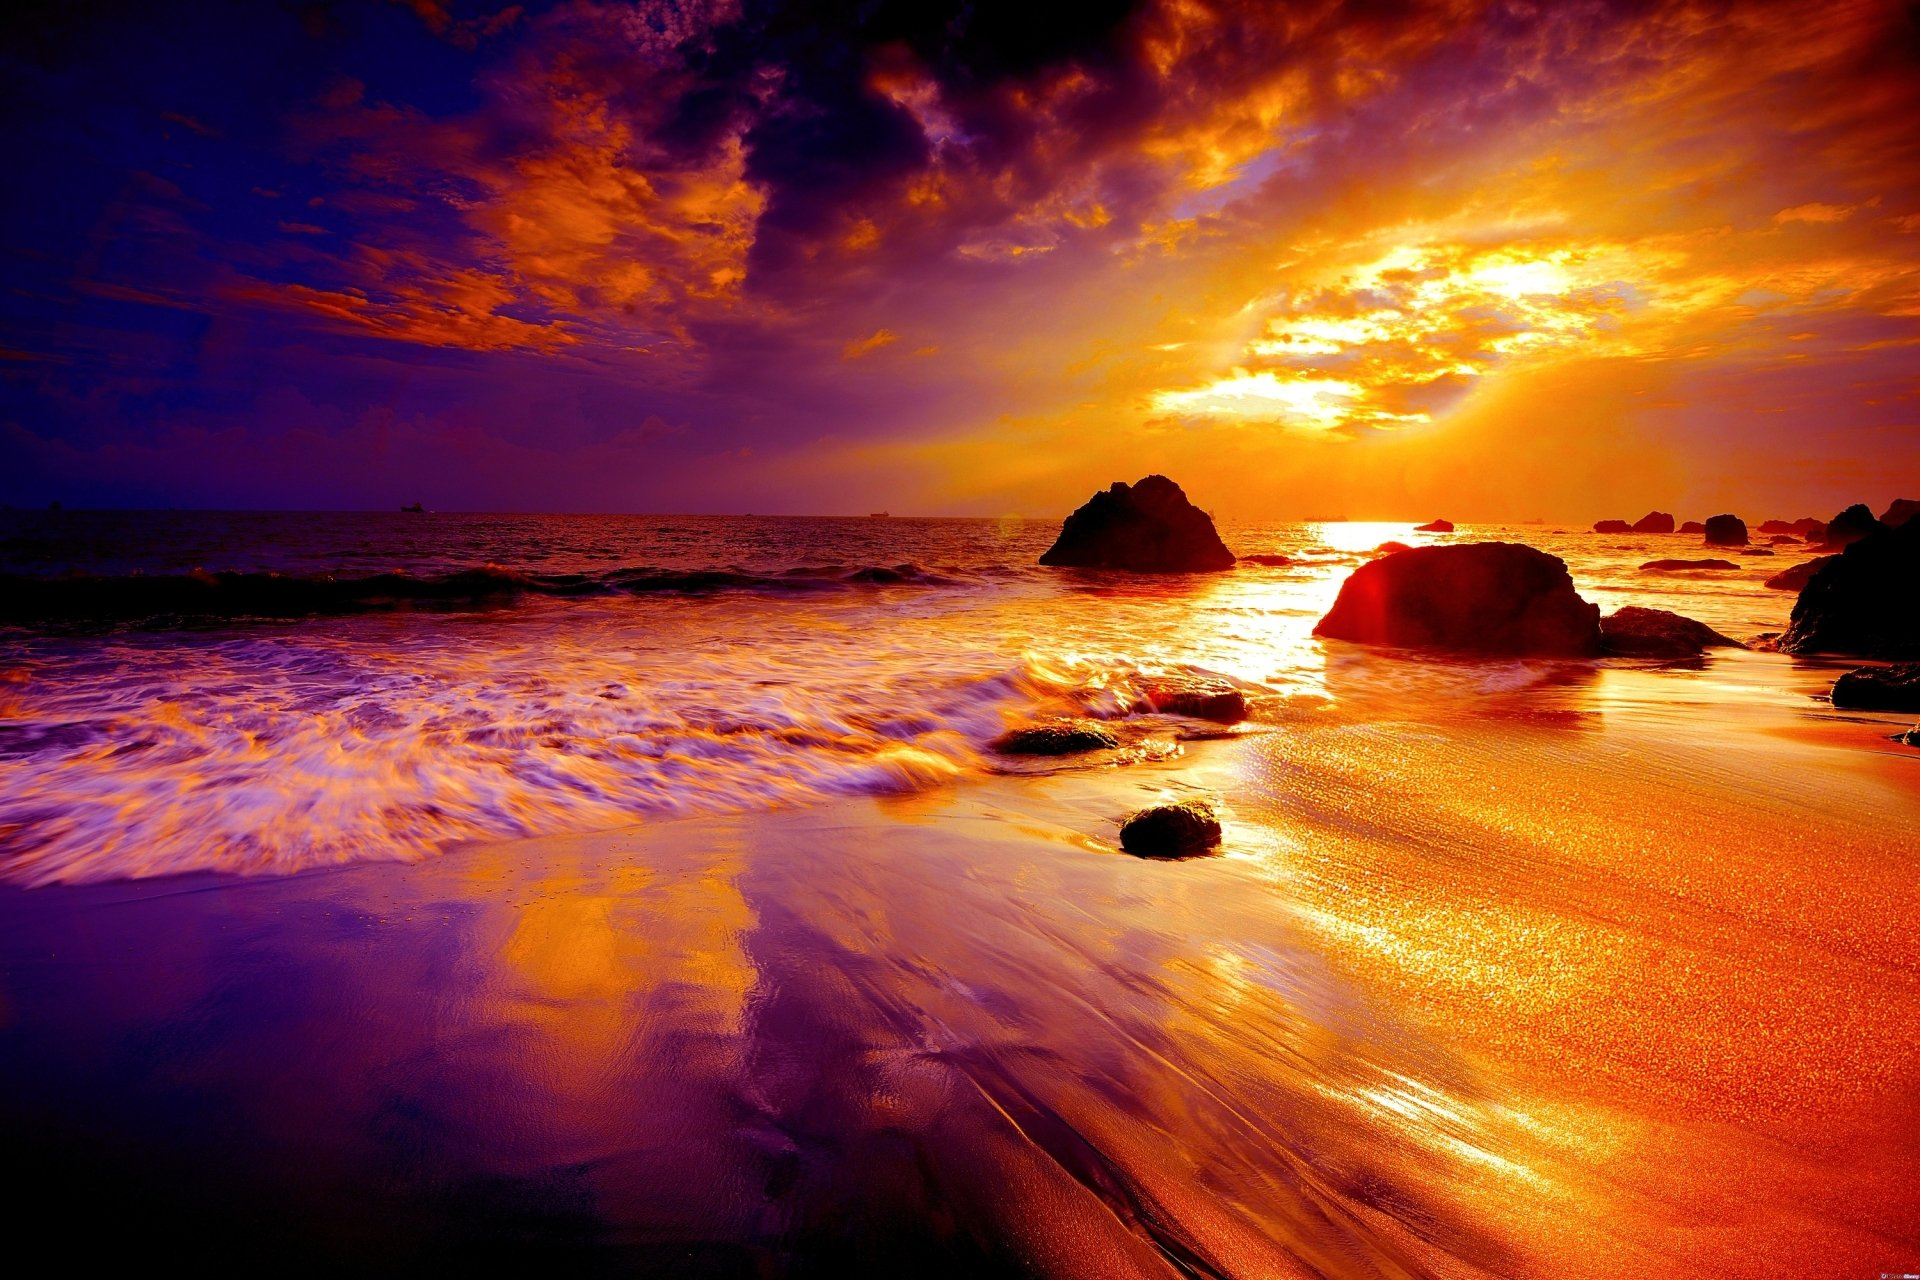 Beach sunset hd wallpaper background image 3000x2000 for Sfondi 4k per pc